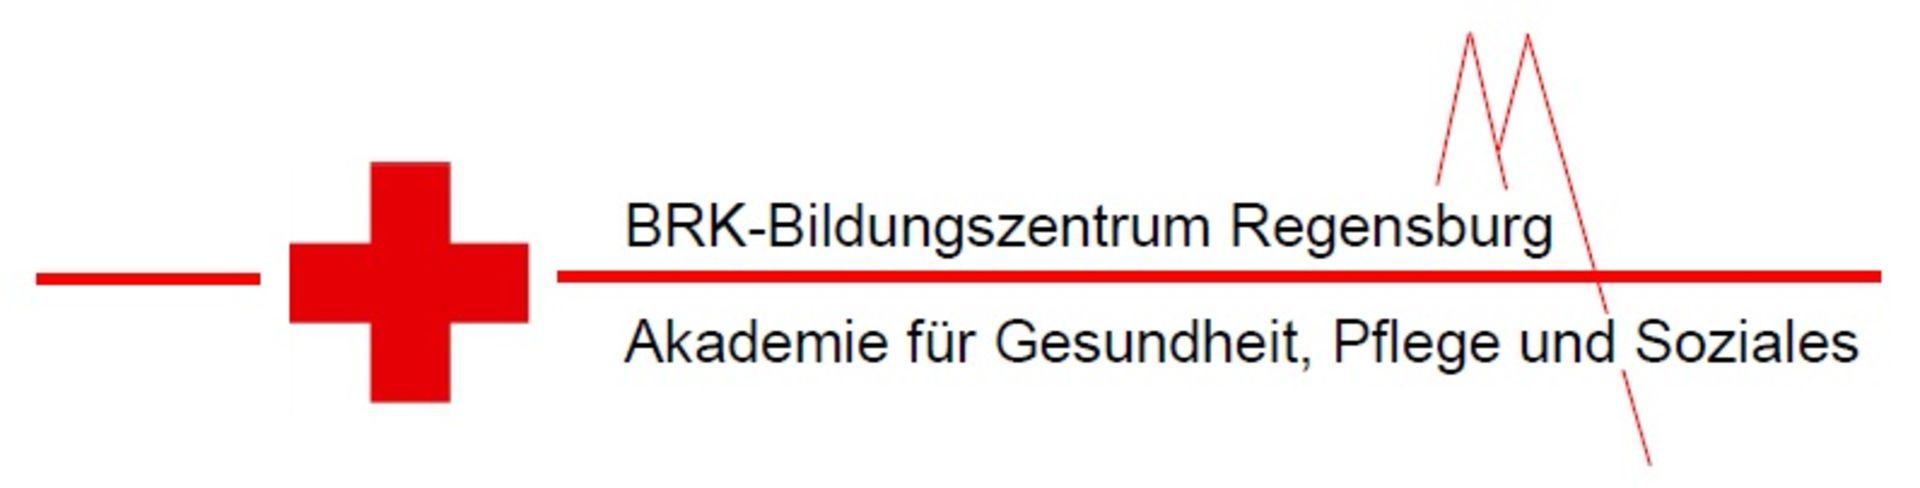 Zertifikatslehrgang Helfer in der Wundversorgung - BRK KV Regensburg